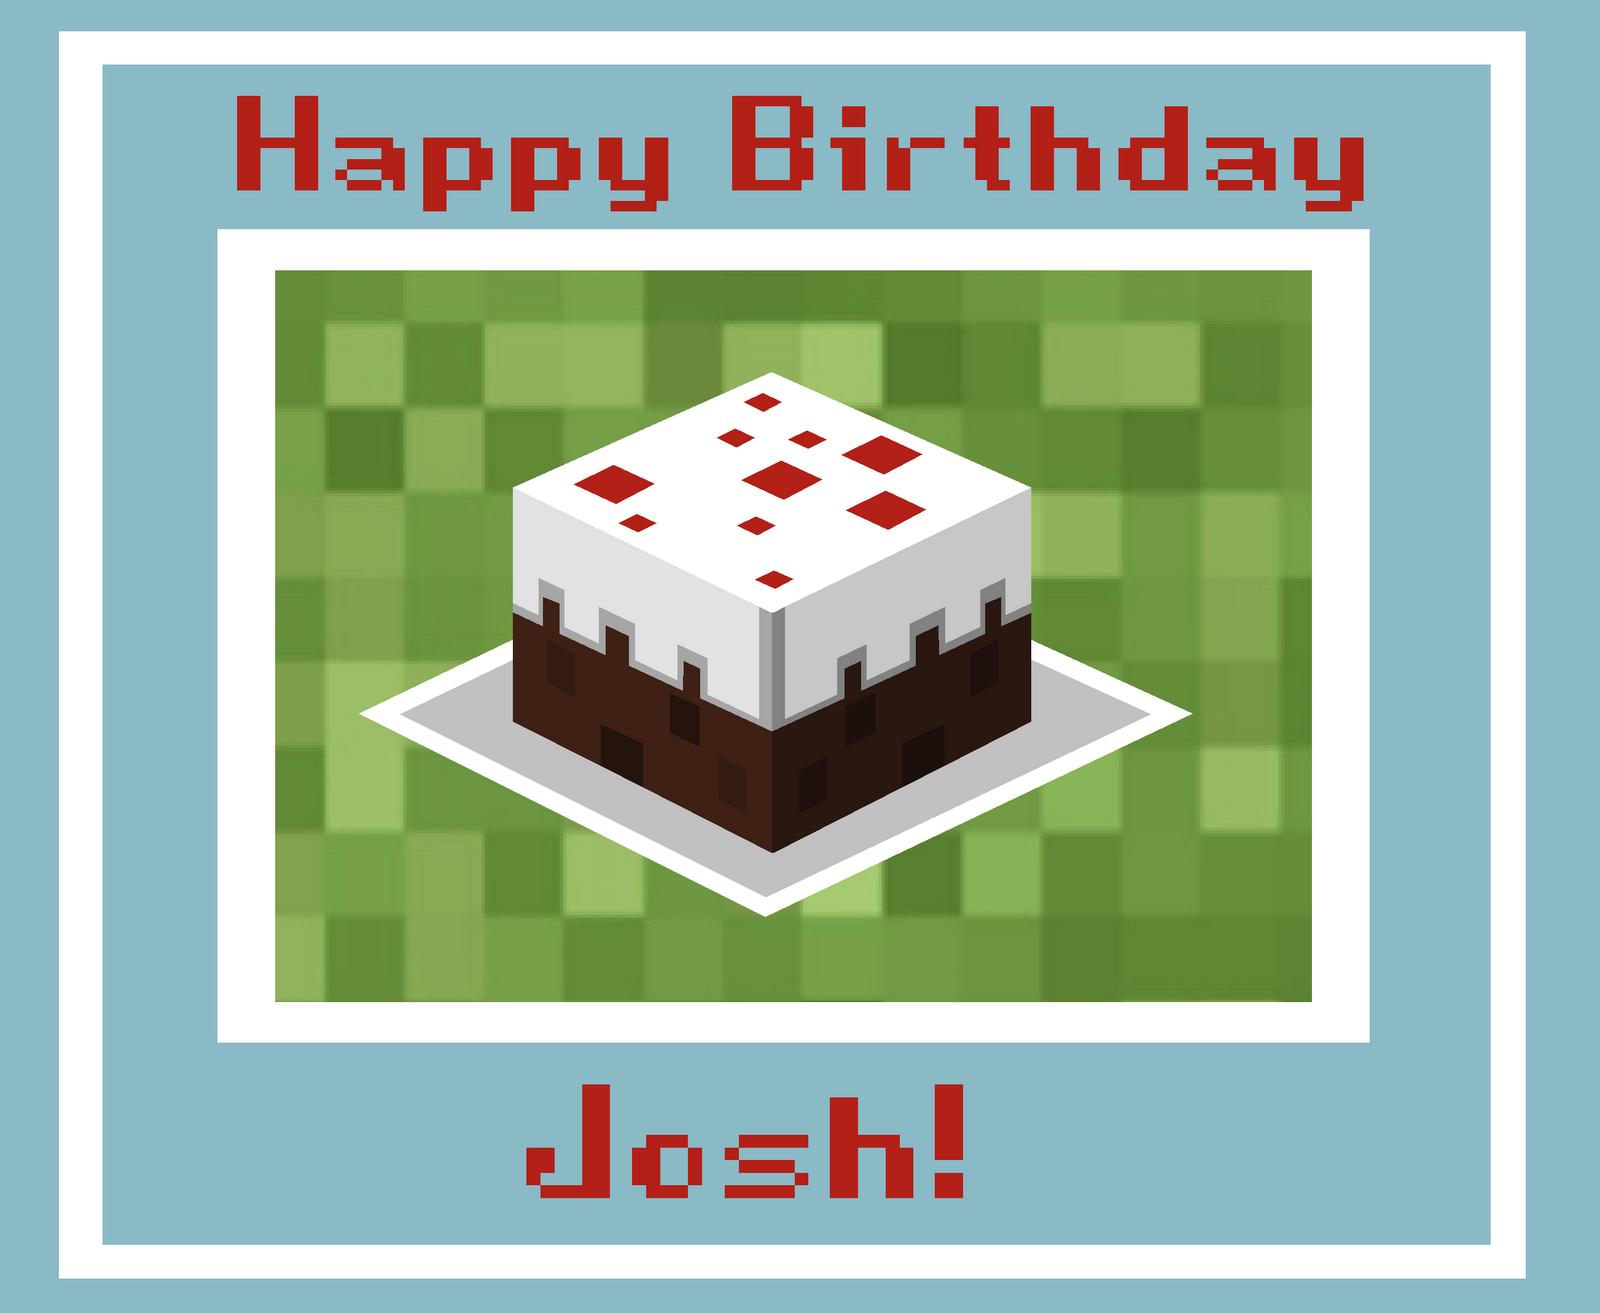 Free Printable Birthday Card Minecraft